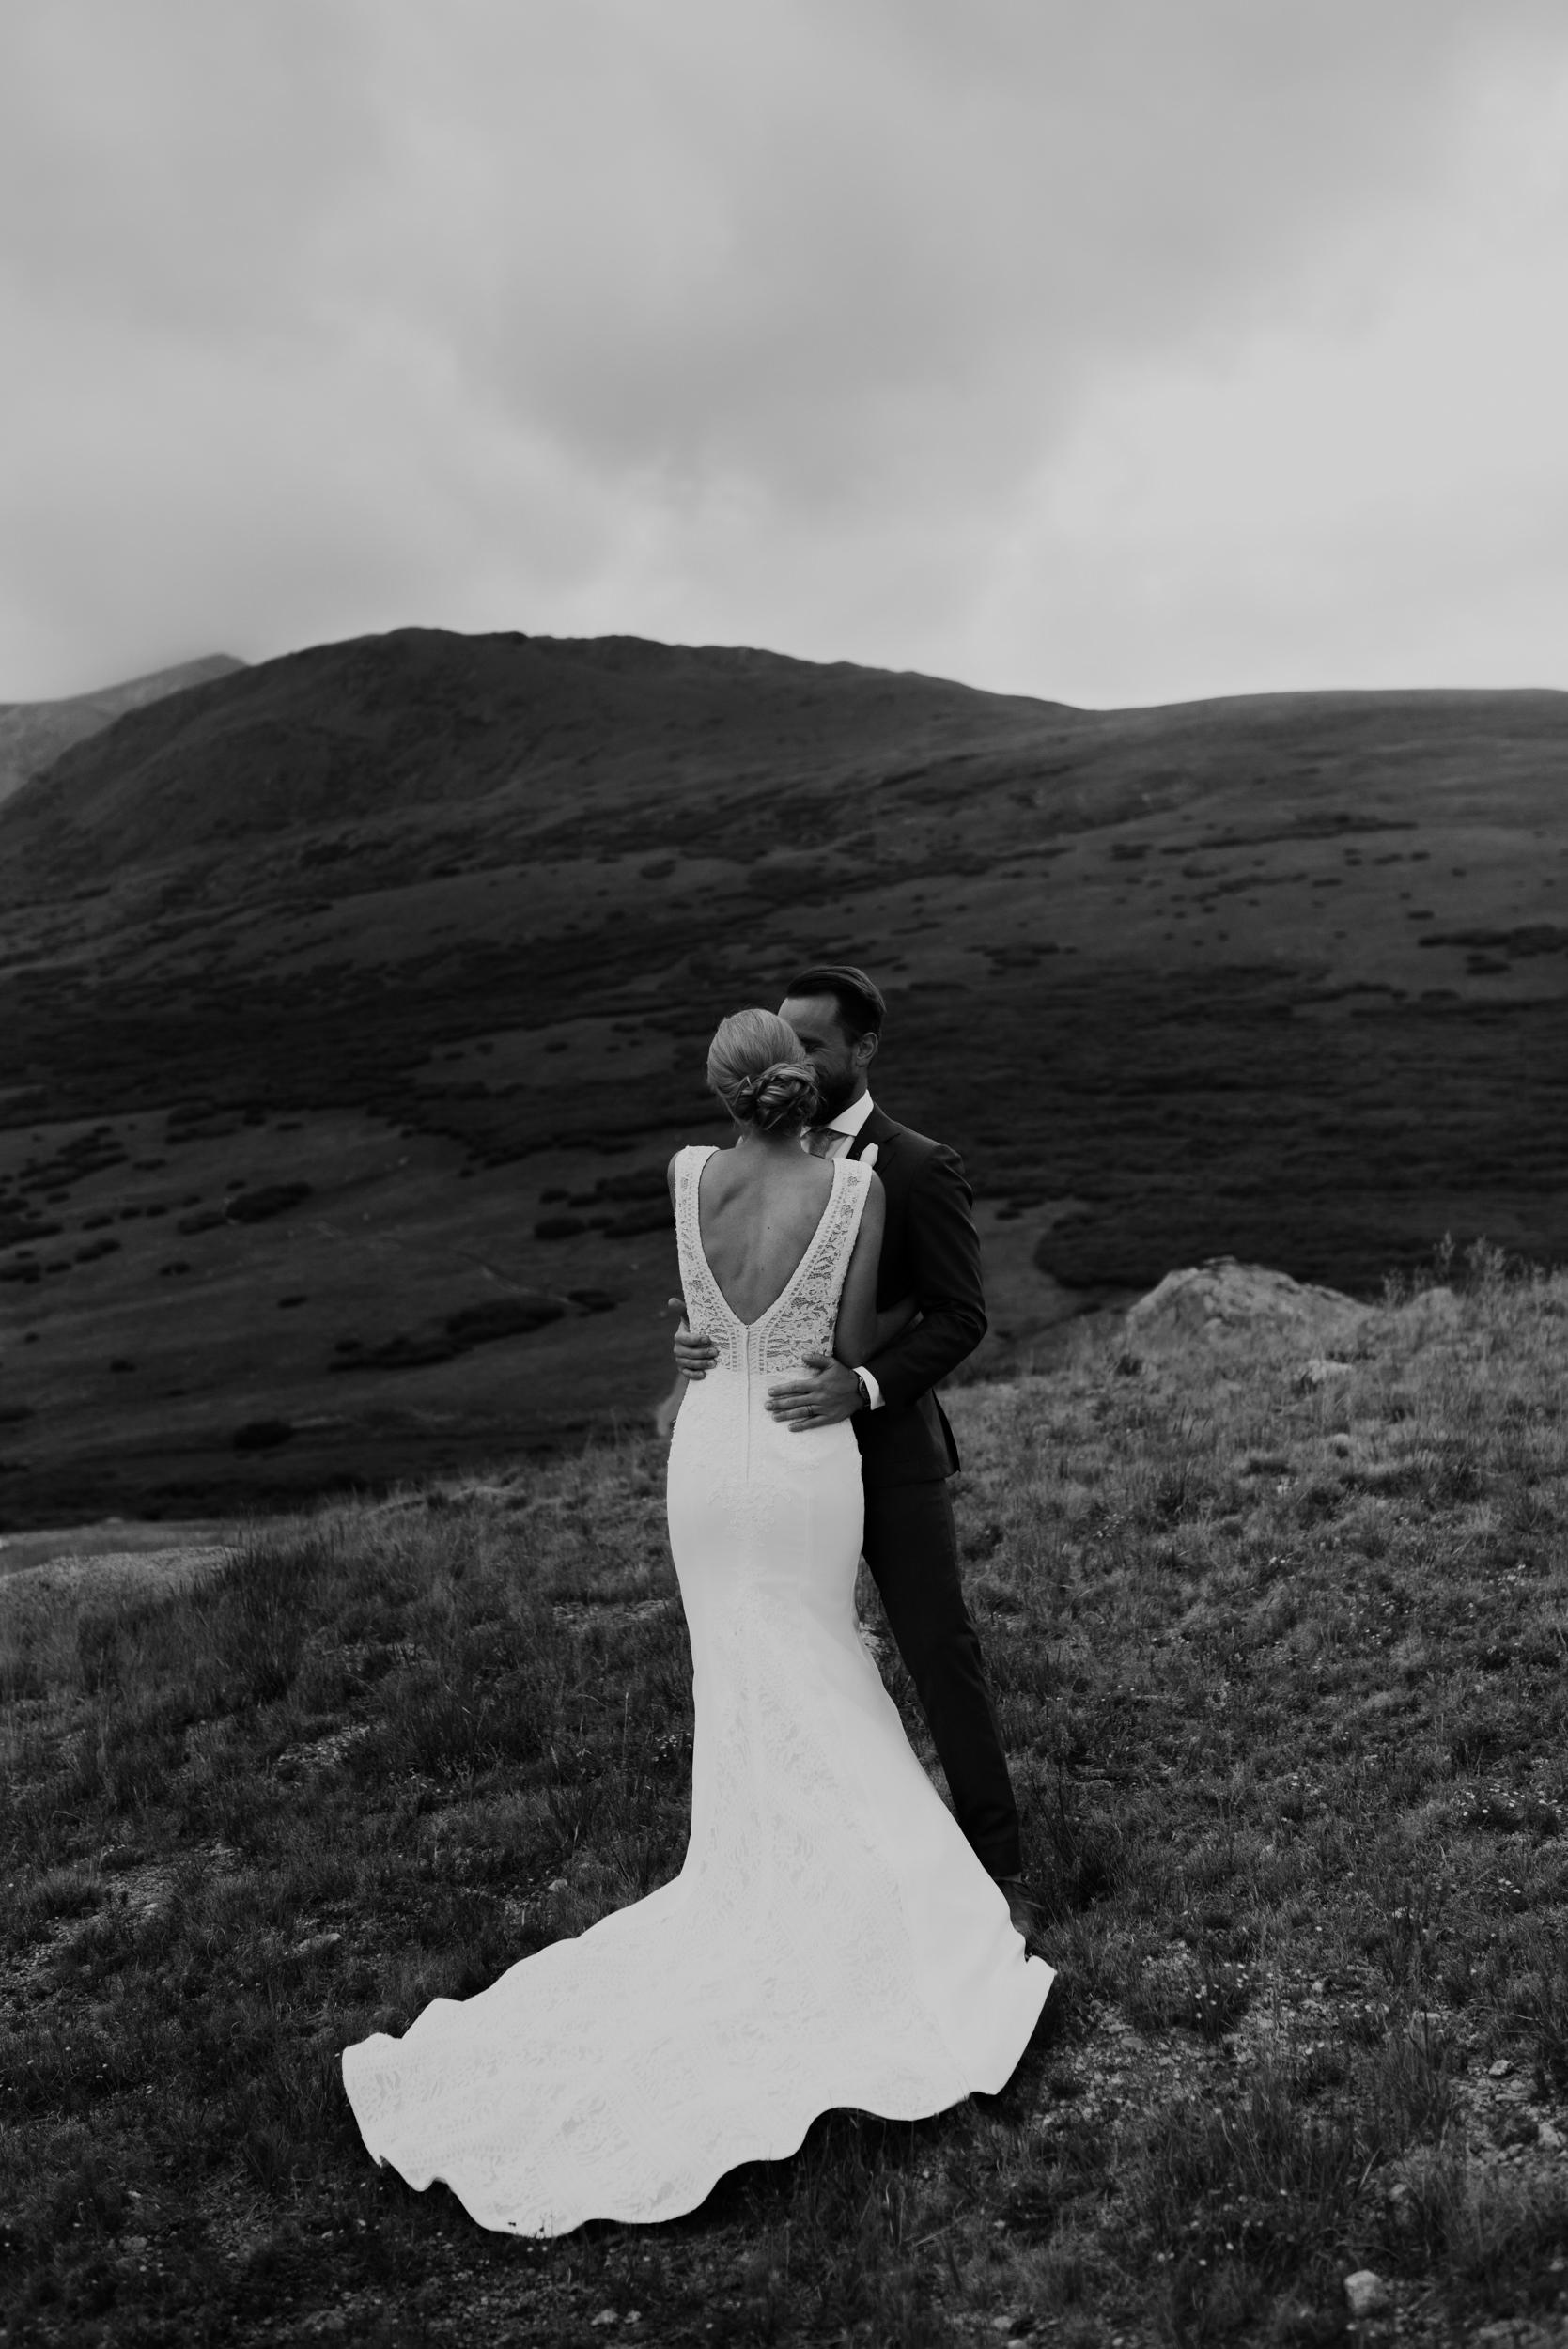 Georgetown, Colorado adventure elopement at Guanella Pass. Colorado elopement and wedding photographer.